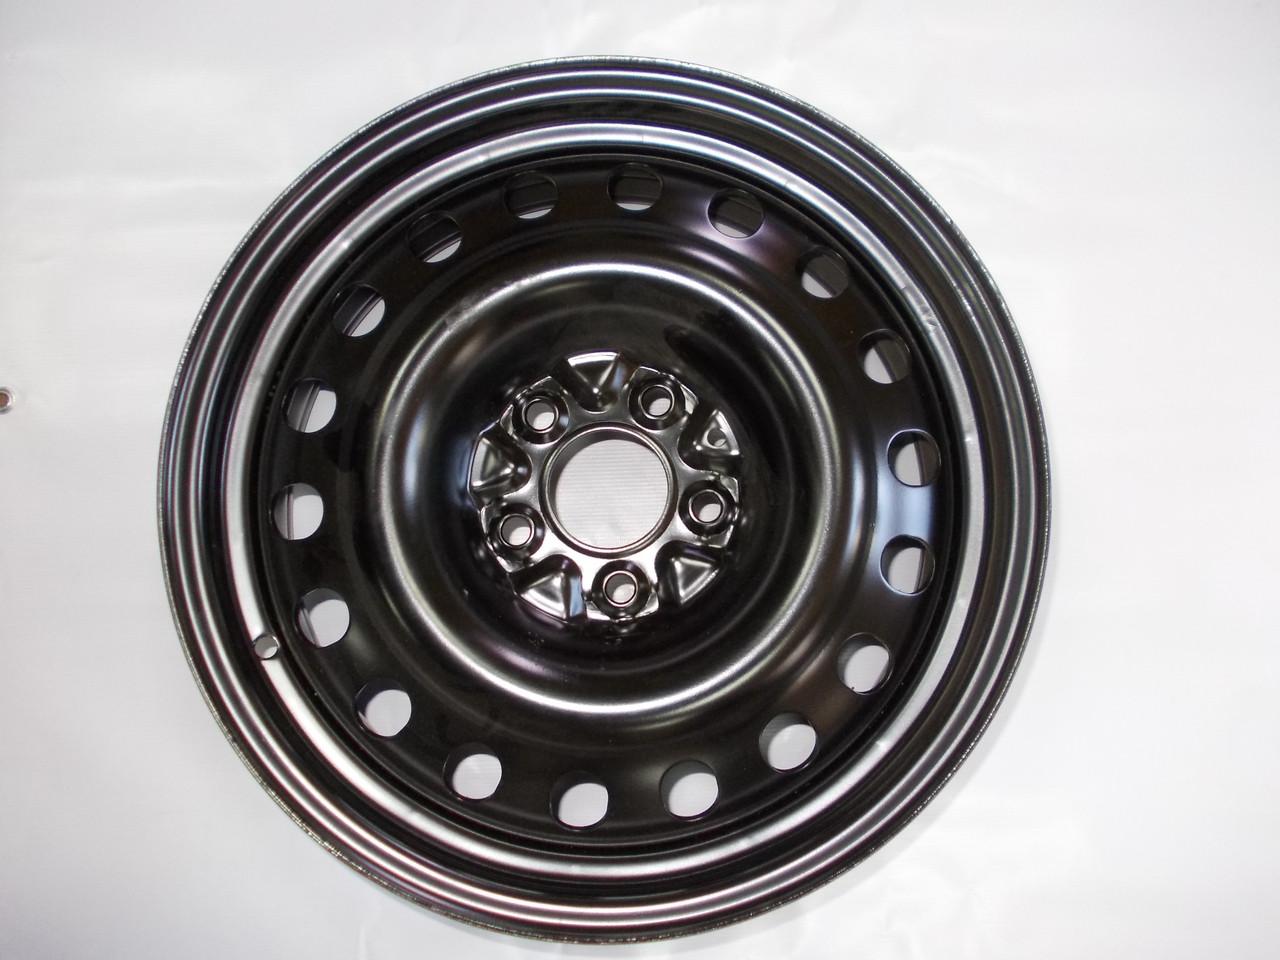 Стальные диски R17 5x114.3, стальные диски на Mazda Tribute, железные диски на Мазду Трибуте